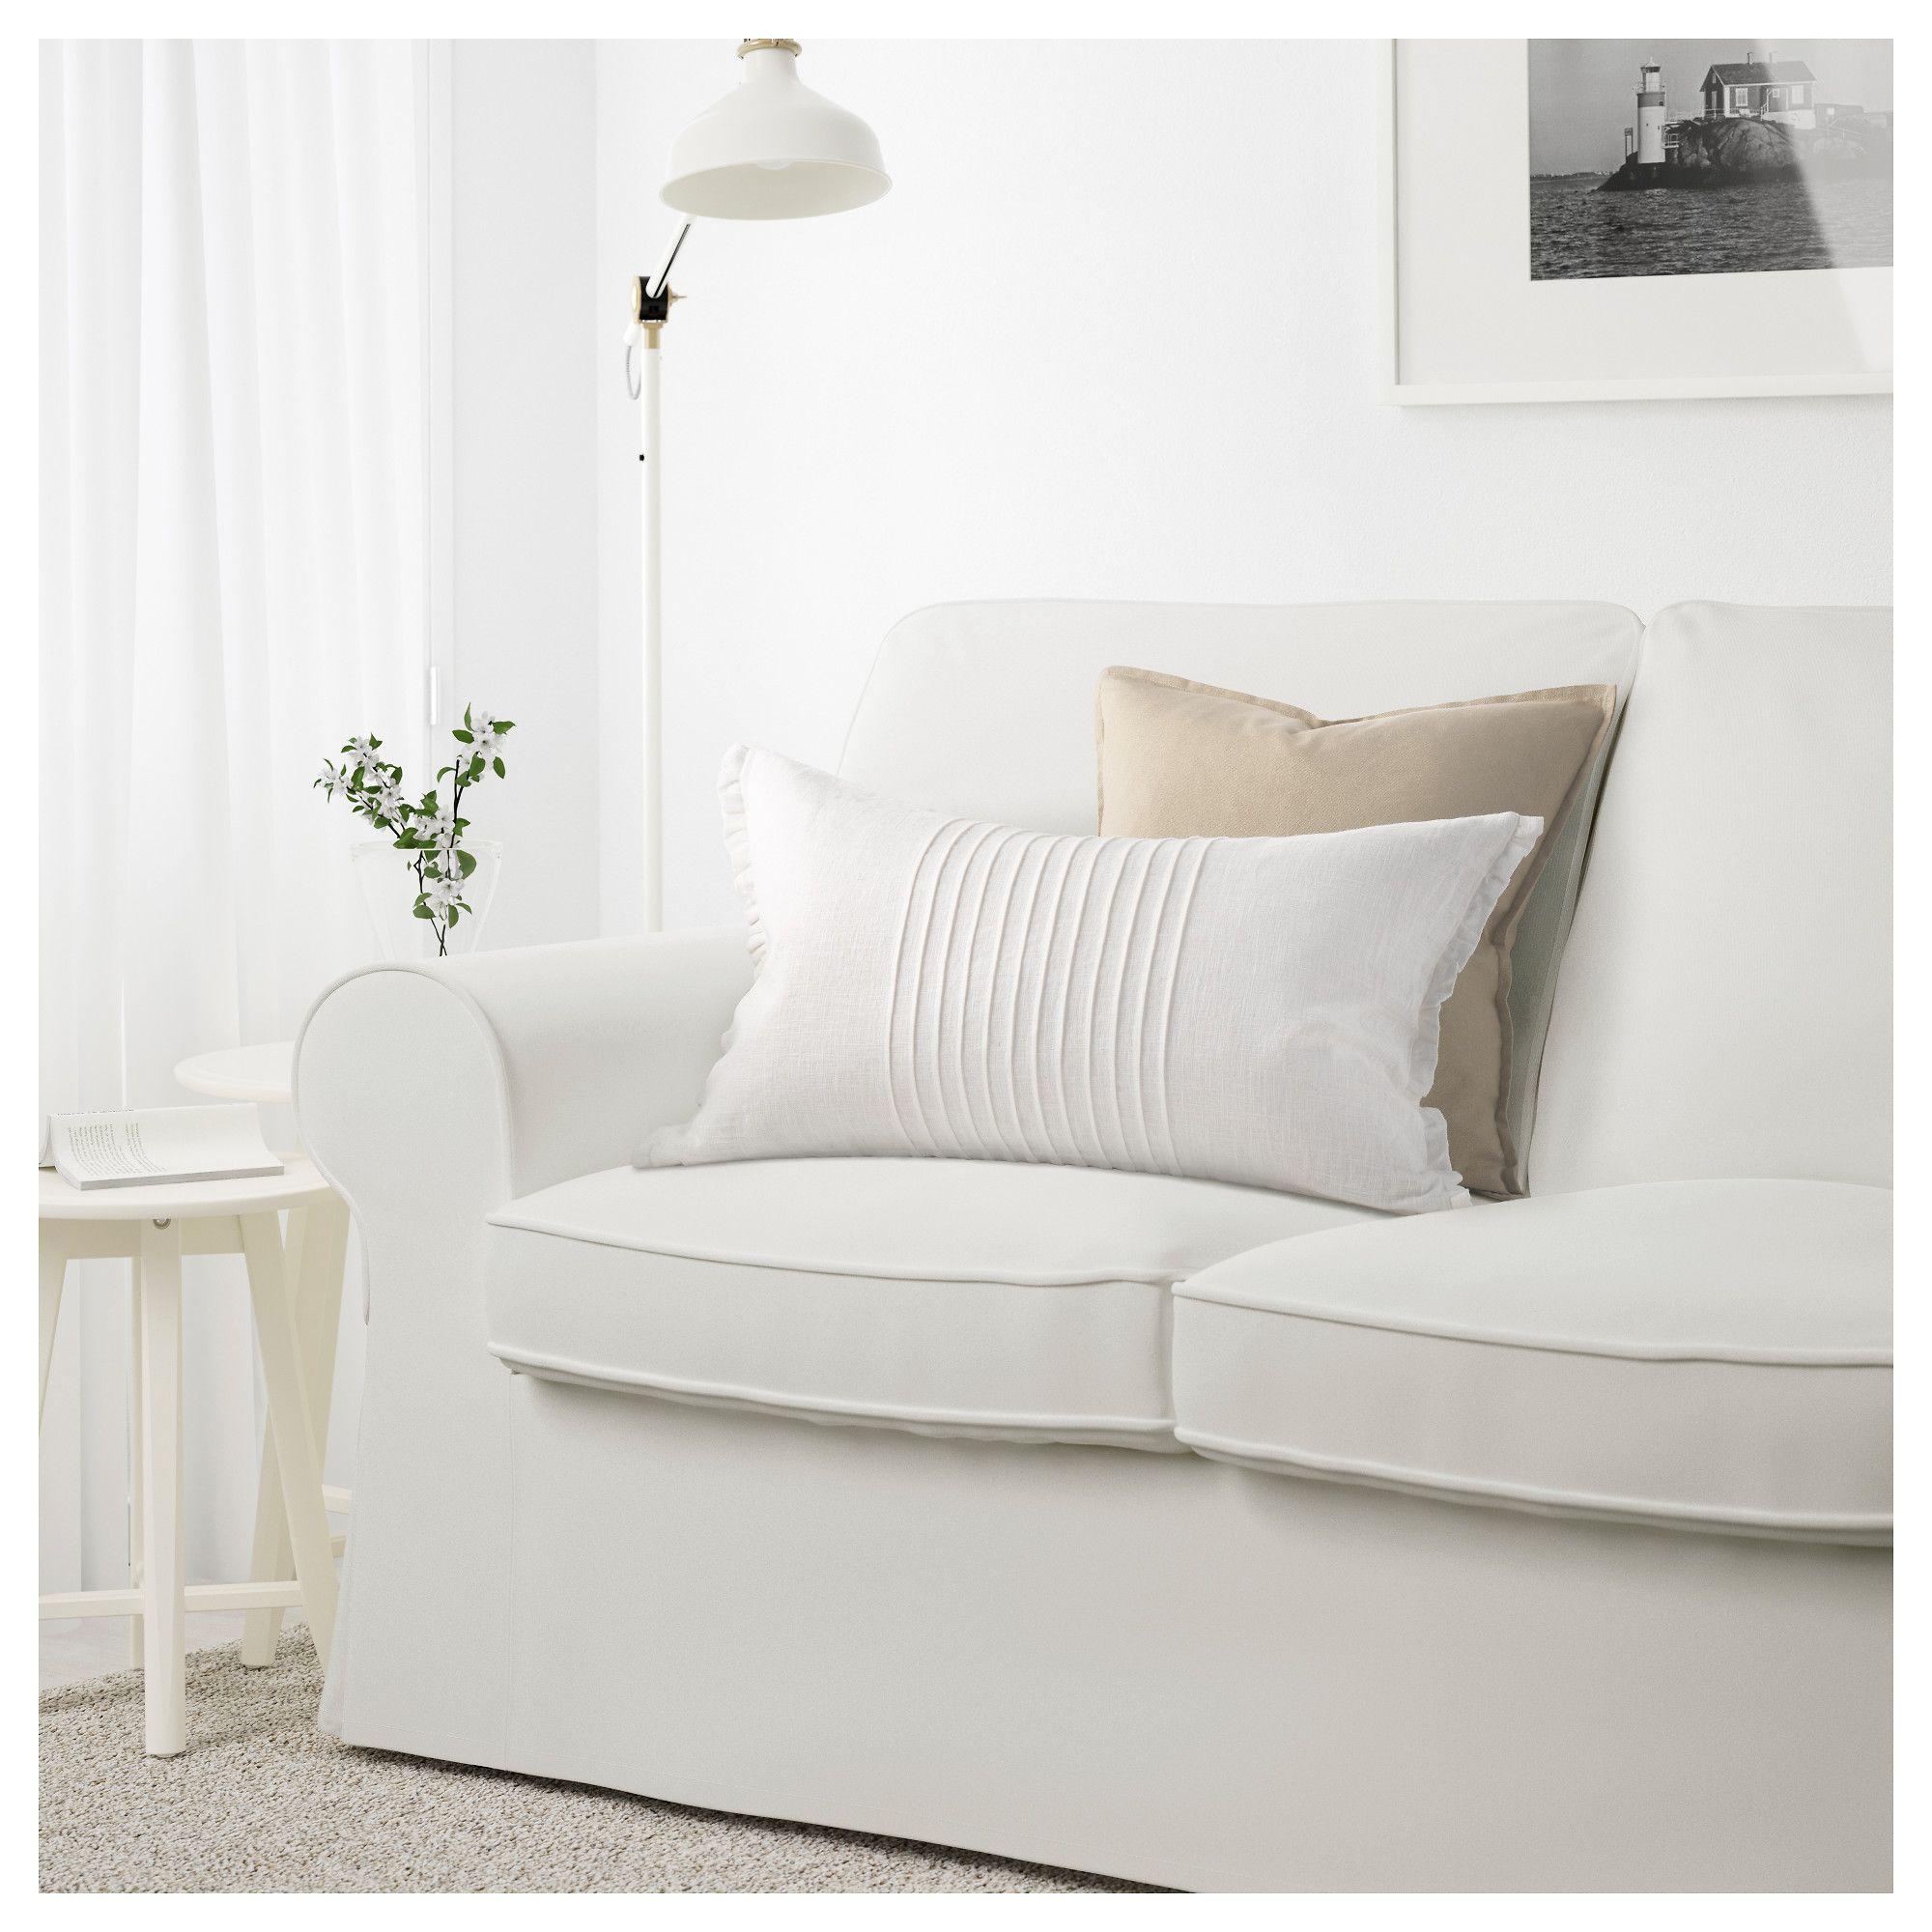 Ikea Ektorp 3 5 Seat Sofa Cover Vittaryd White Ektorp